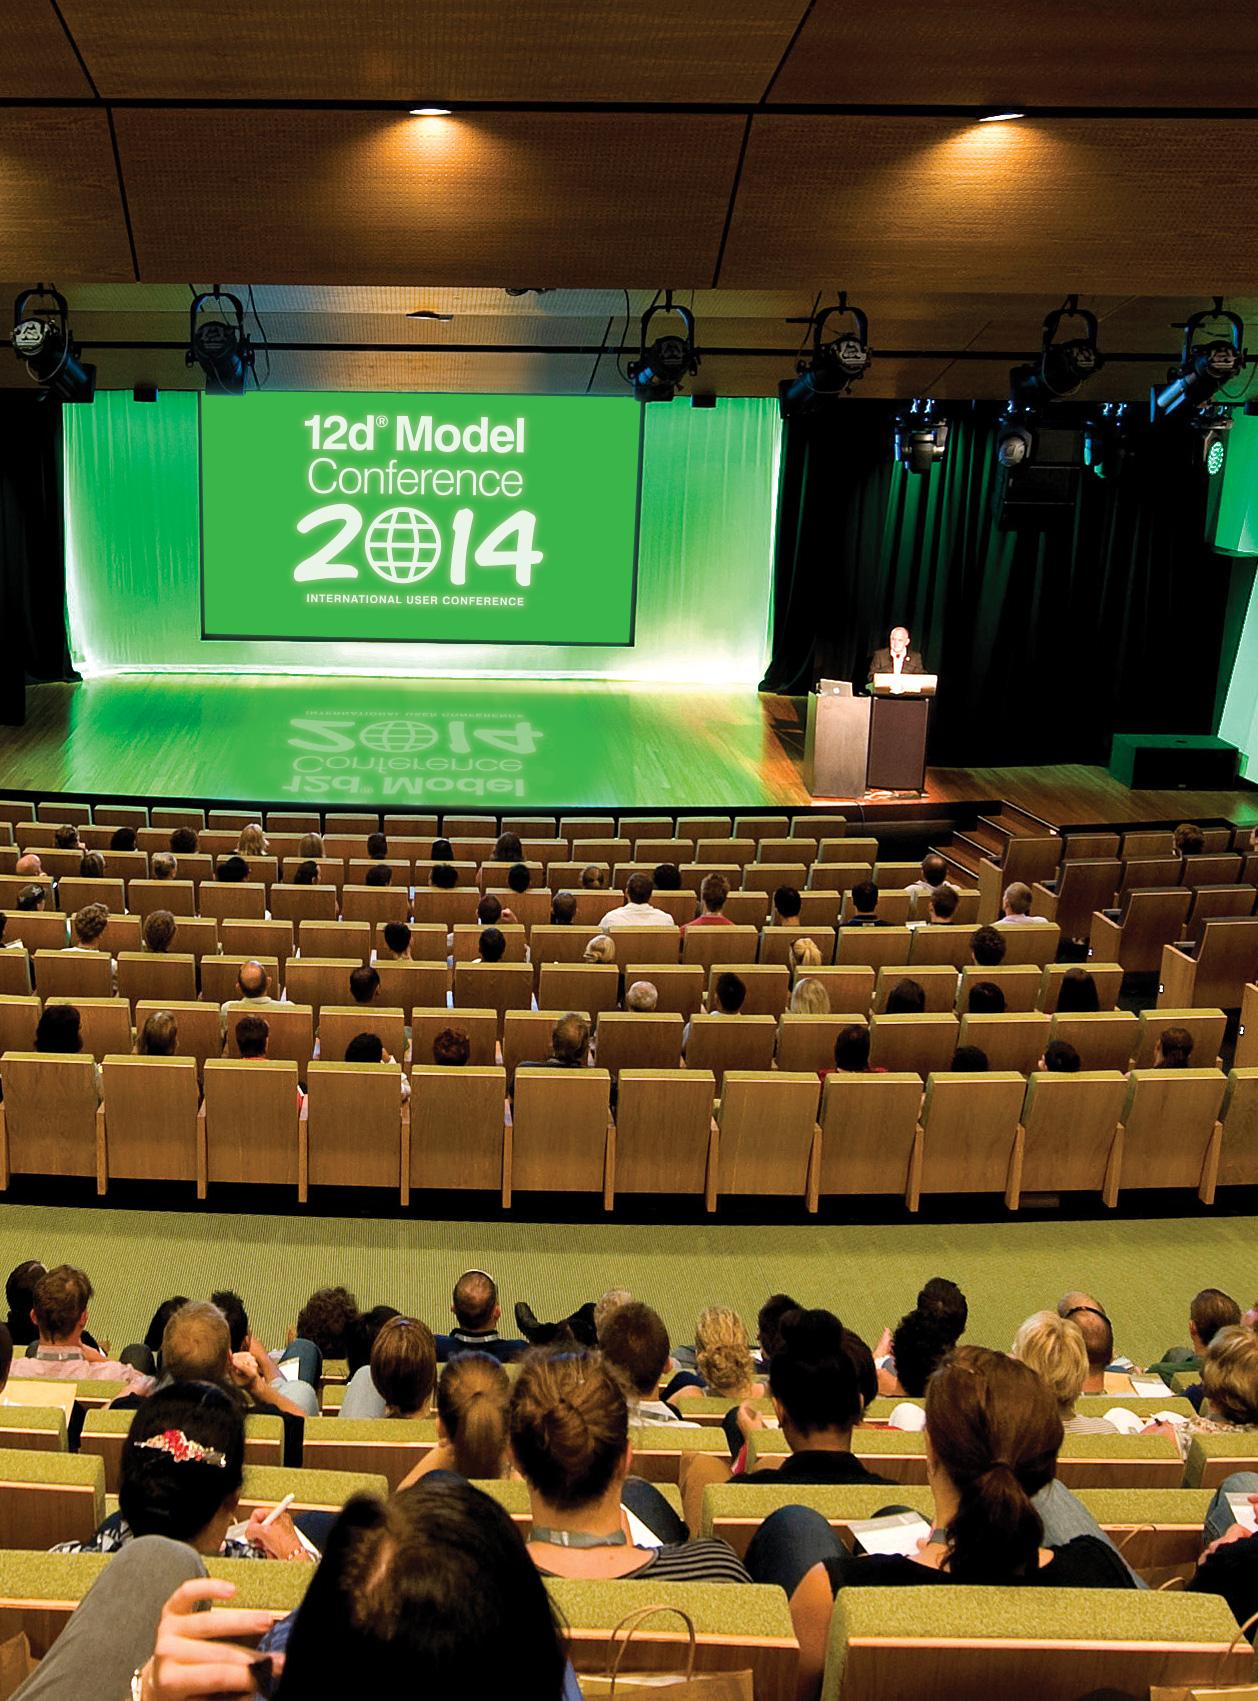 Brisbane Convention Centre